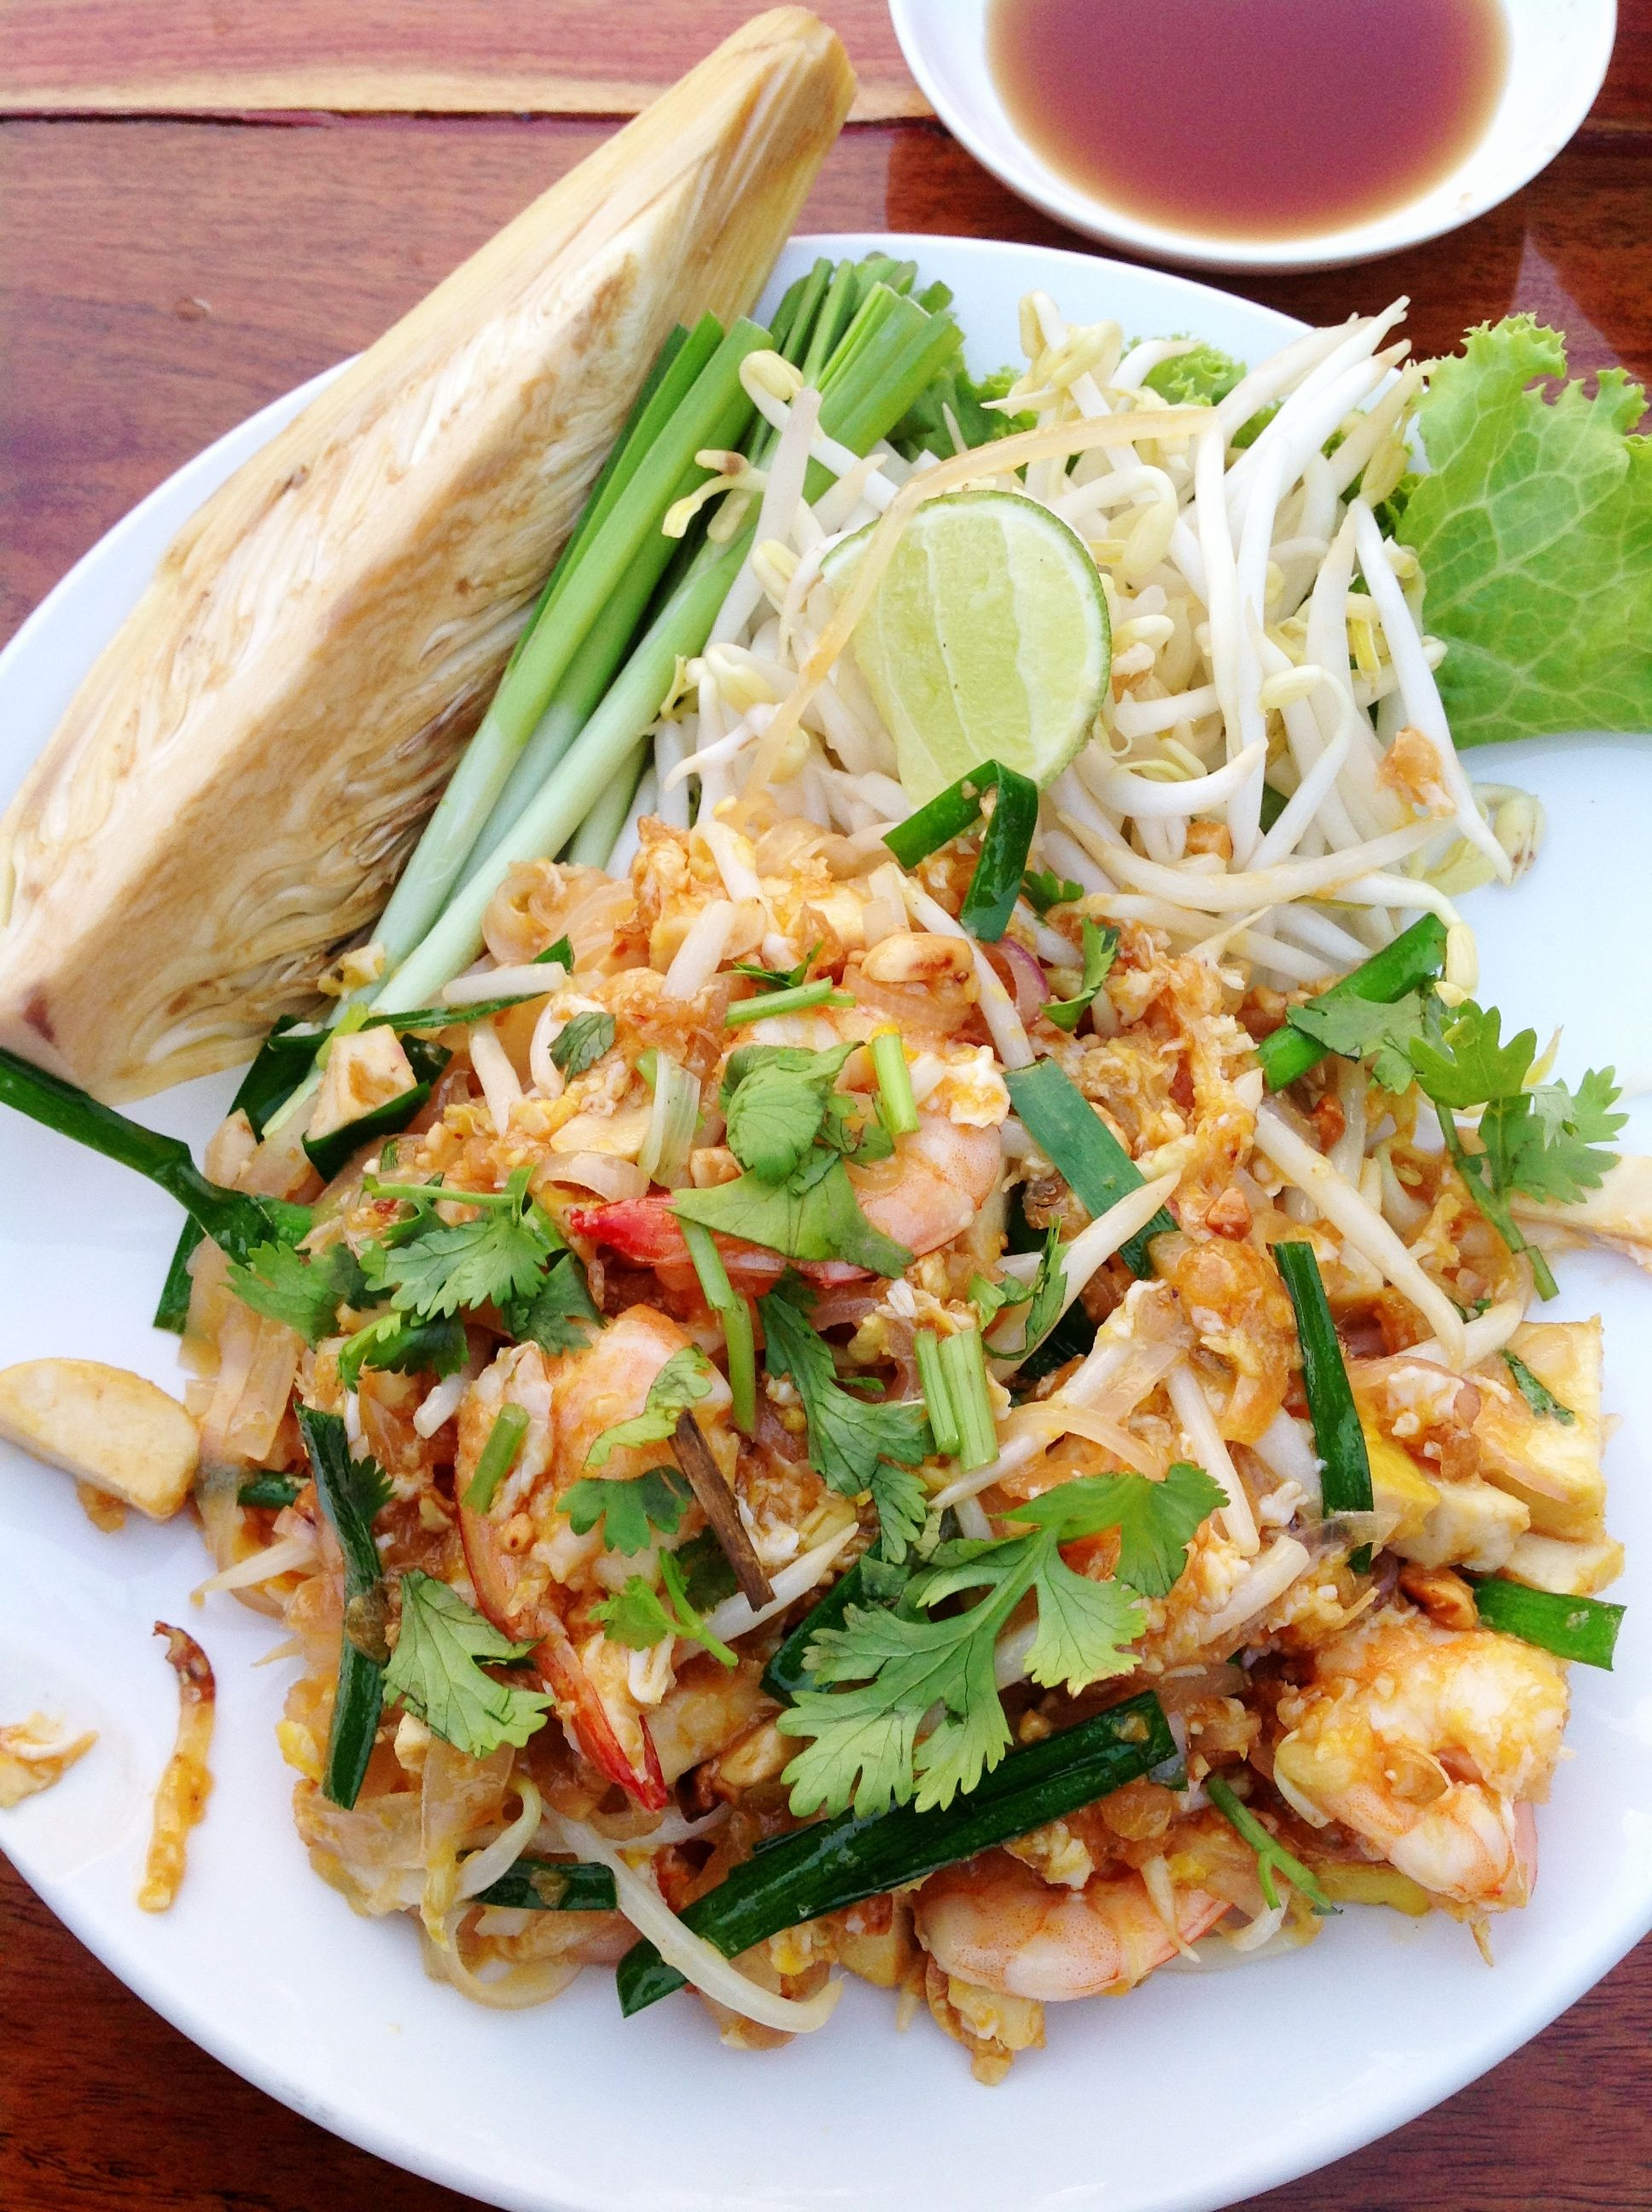 pad thai cuisine thailand pinterest thai recipes forumfinder Gallery